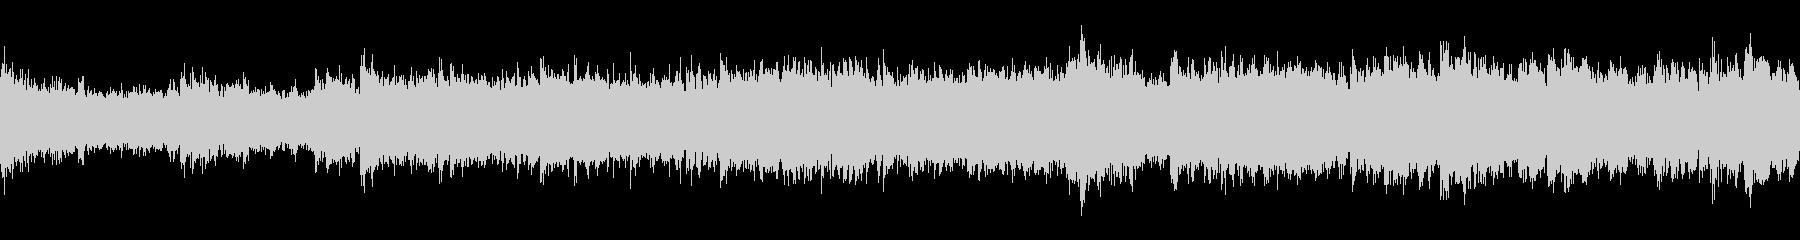 YAMATO_60secの未再生の波形